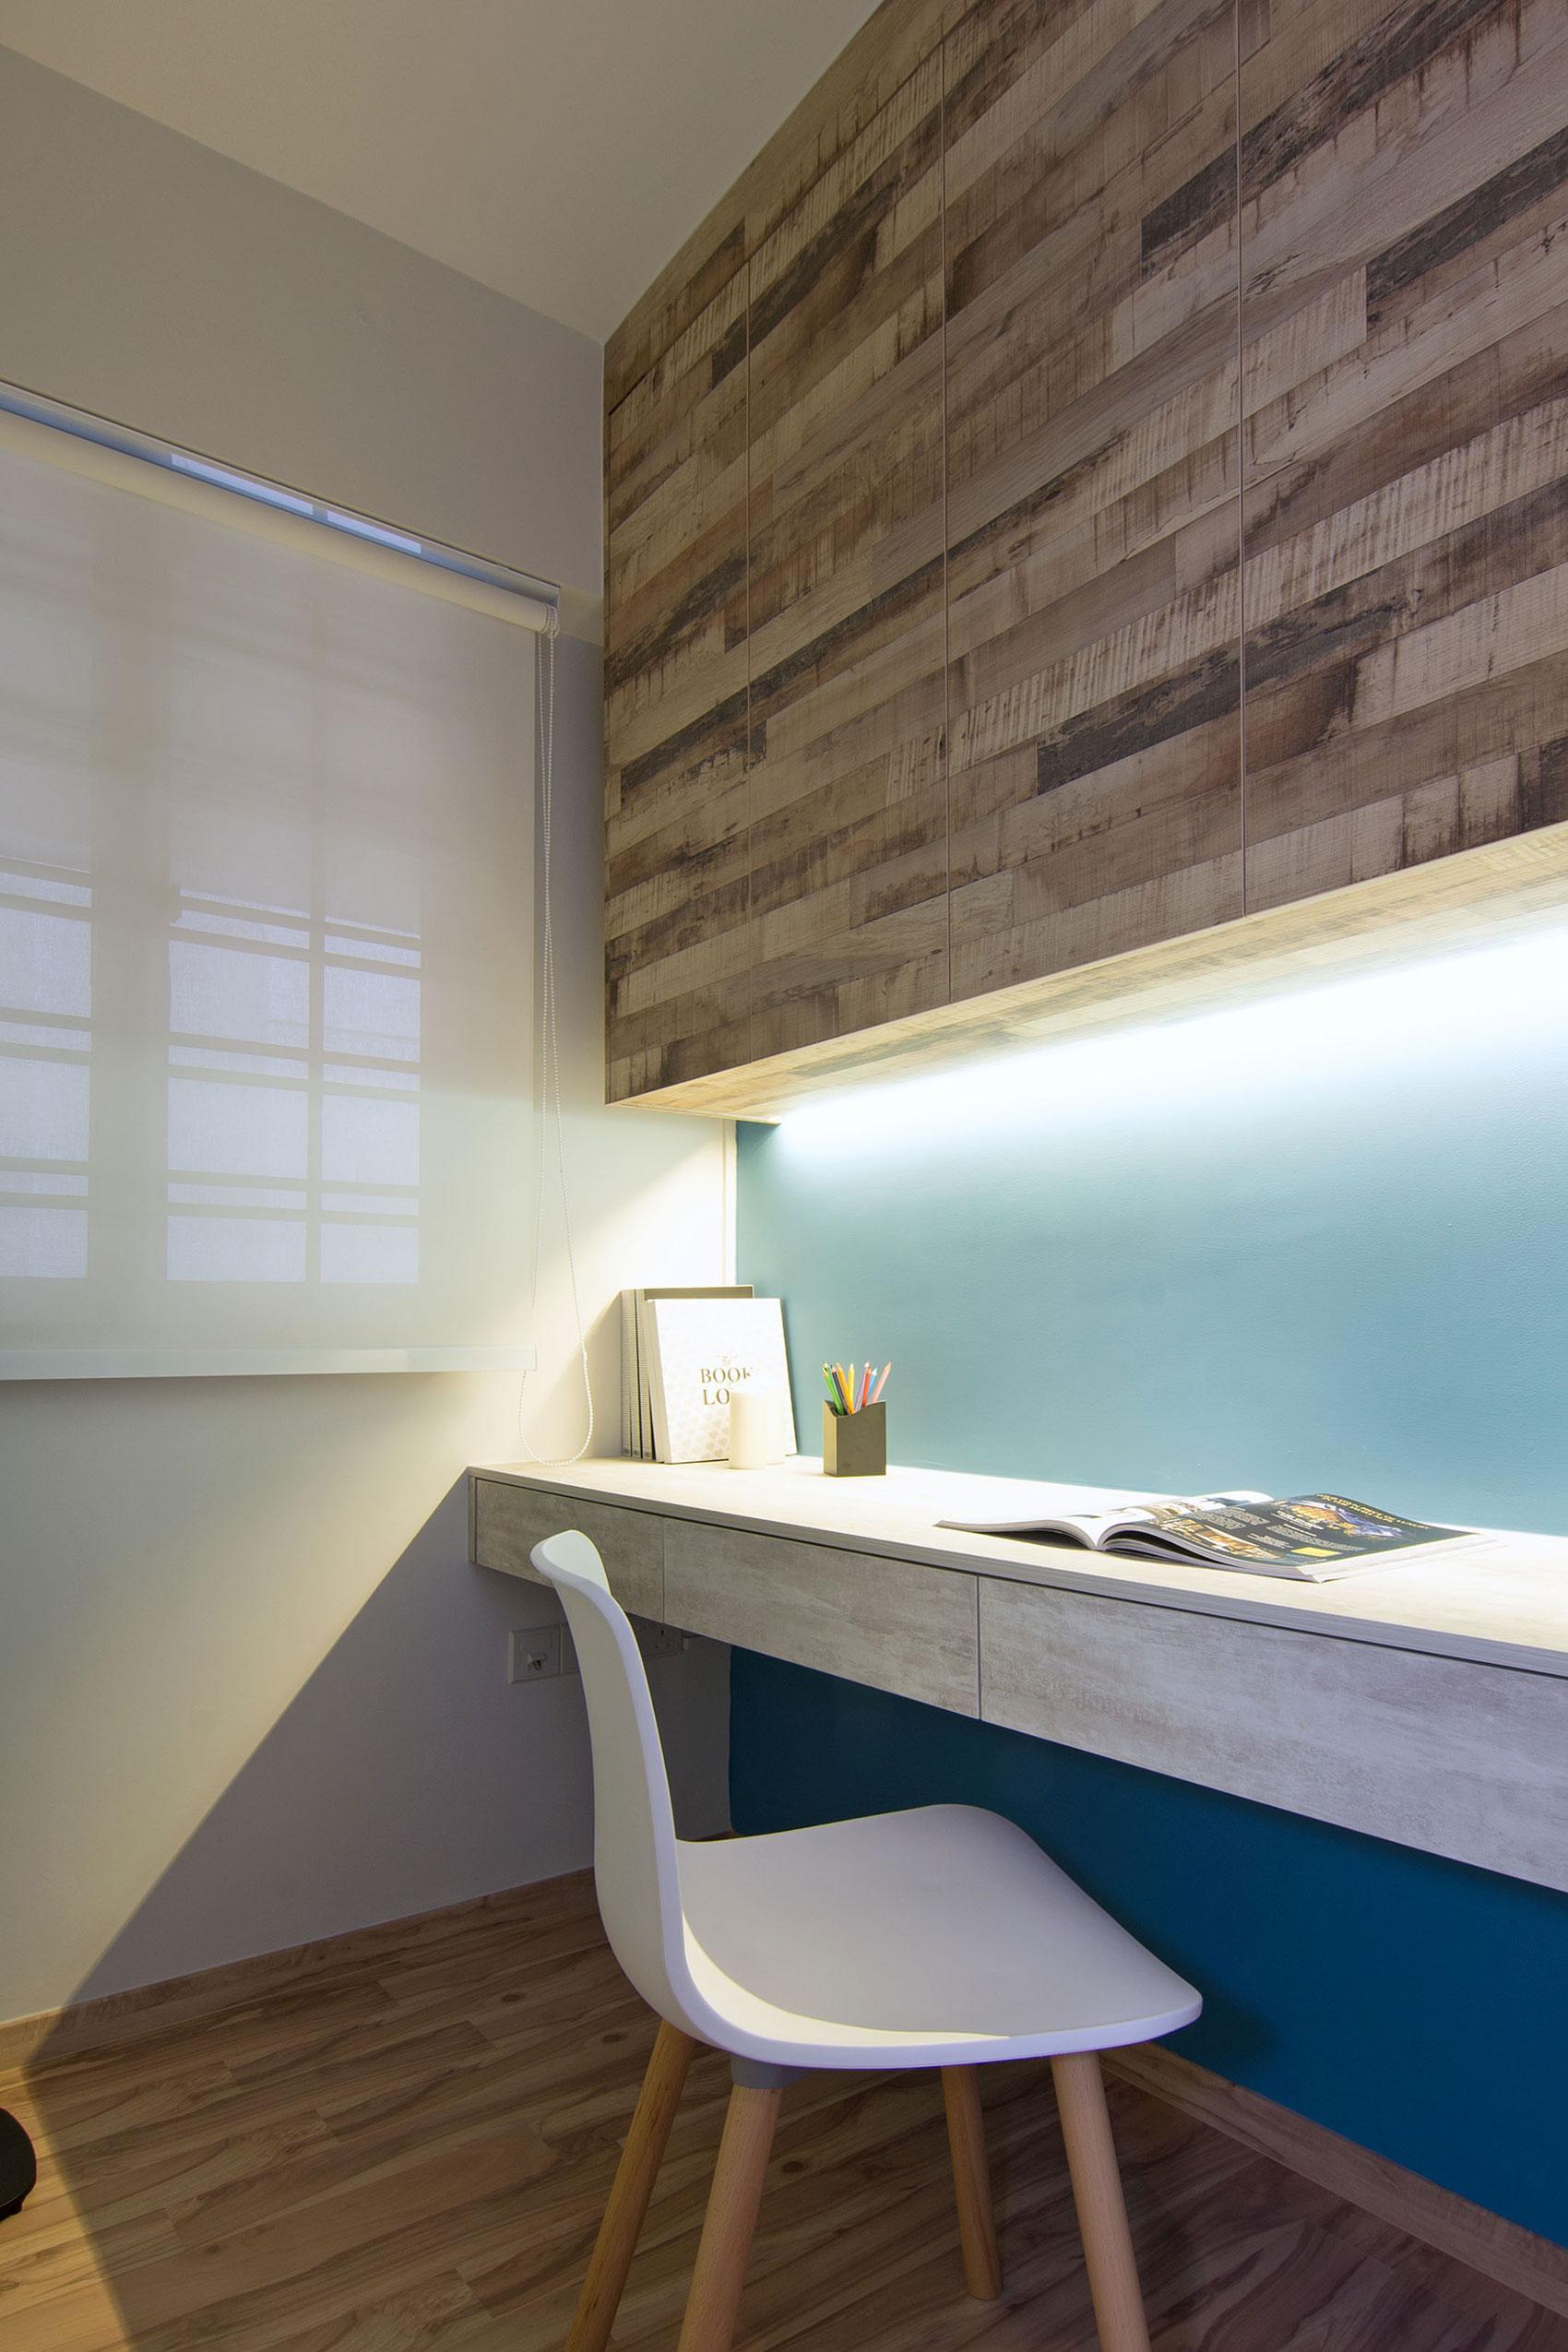 Beach house urban apartment in Singapore by Vievva Designers-15